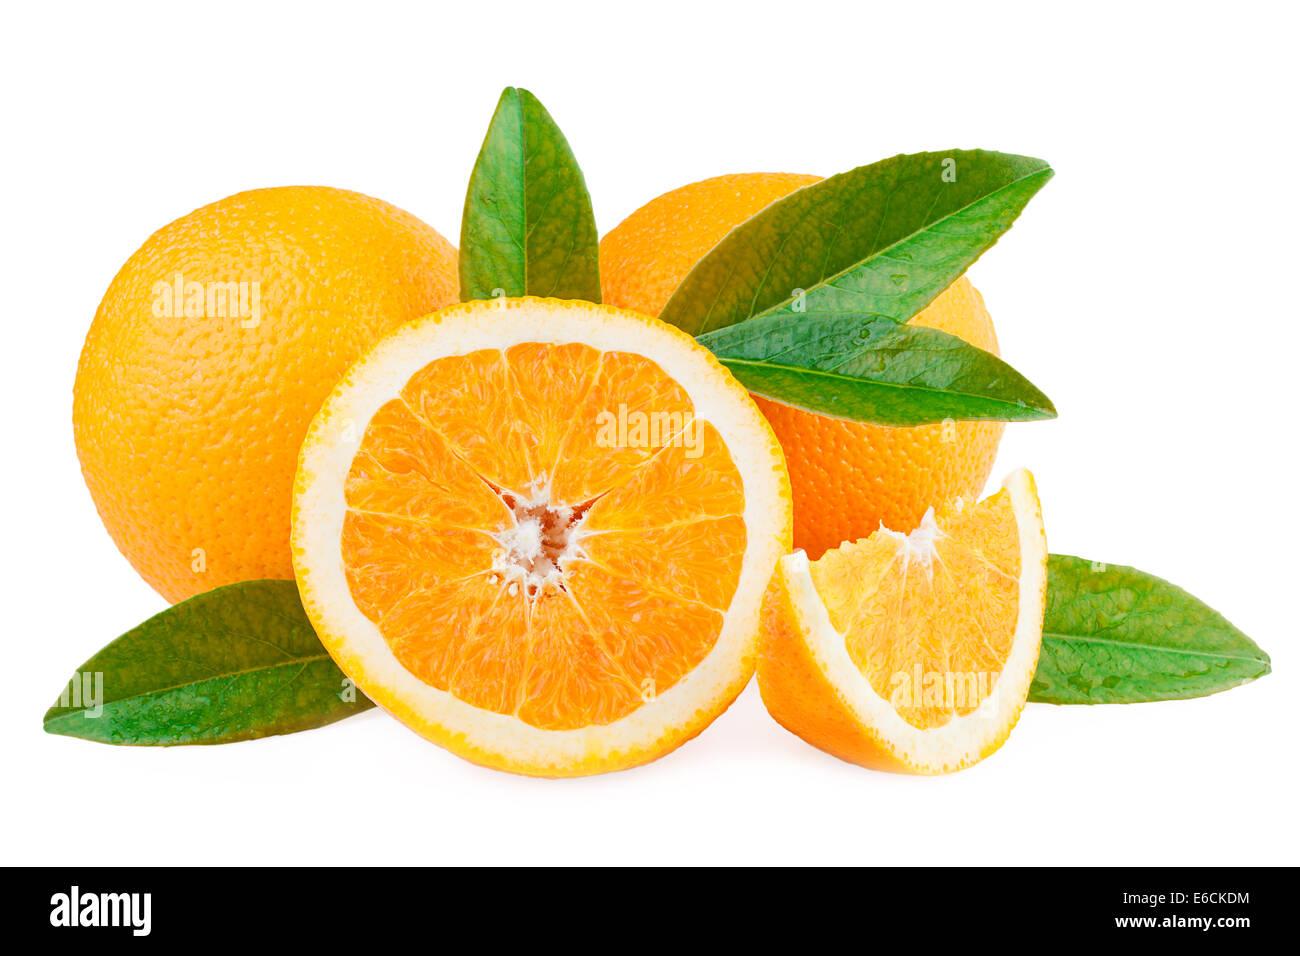 Oranges Fruits over white - Stock Image